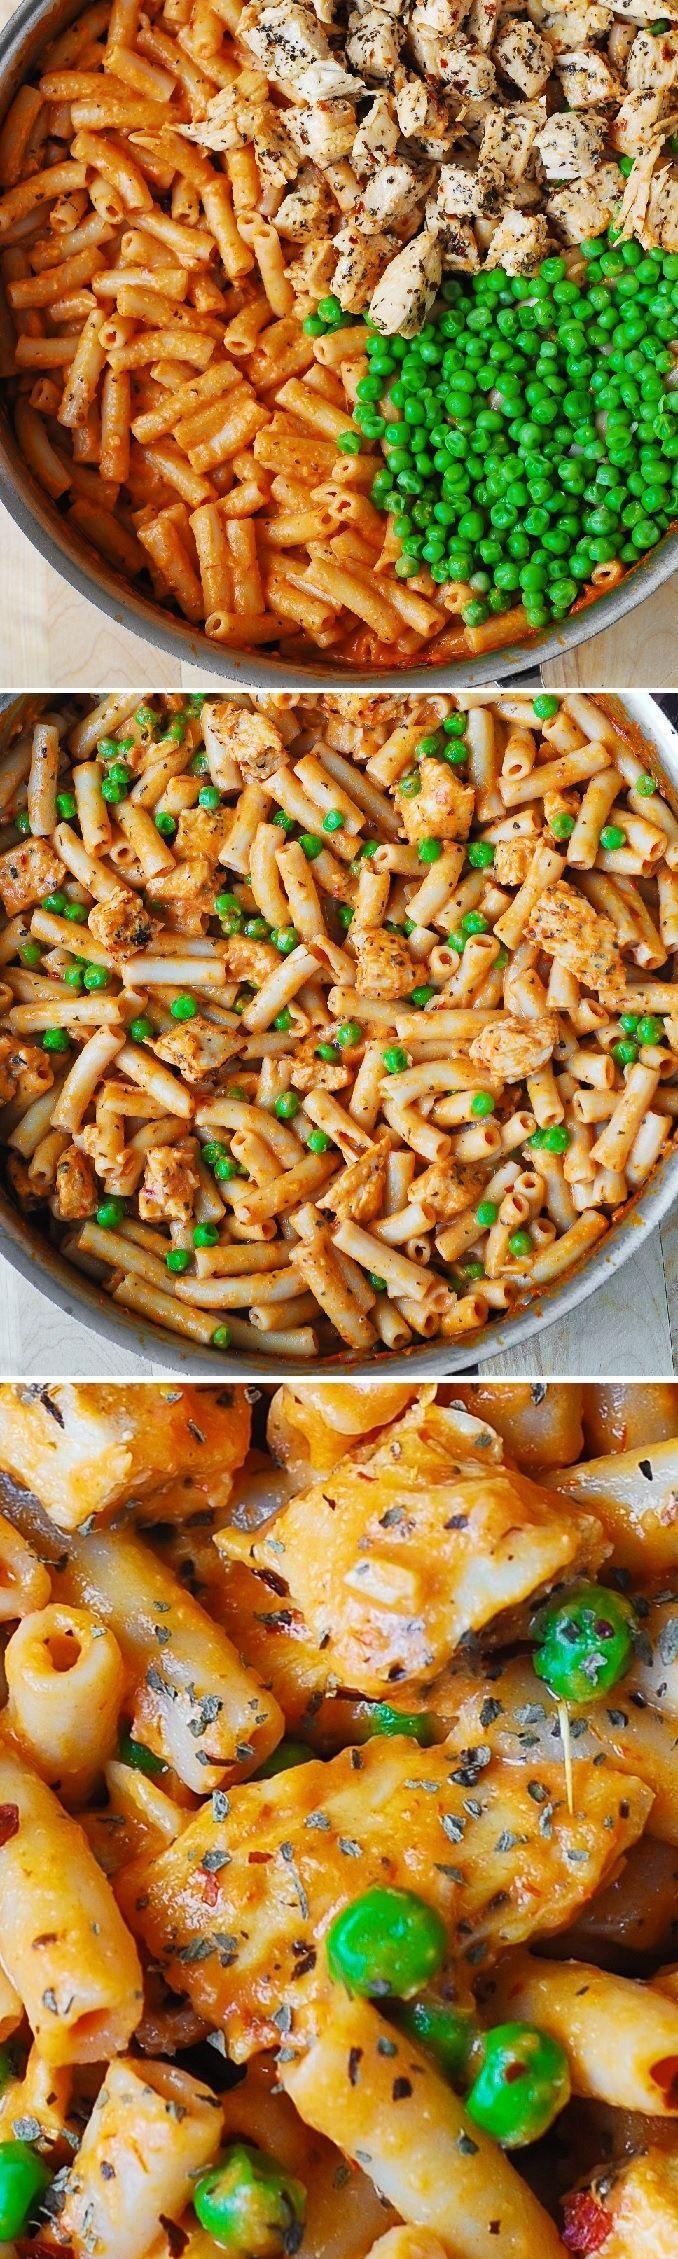 Spicy Chicken Pasta with Peas - Delicious, Italian-style pasta with a creamy Mozzarella cheese sauce! SO GOOD!